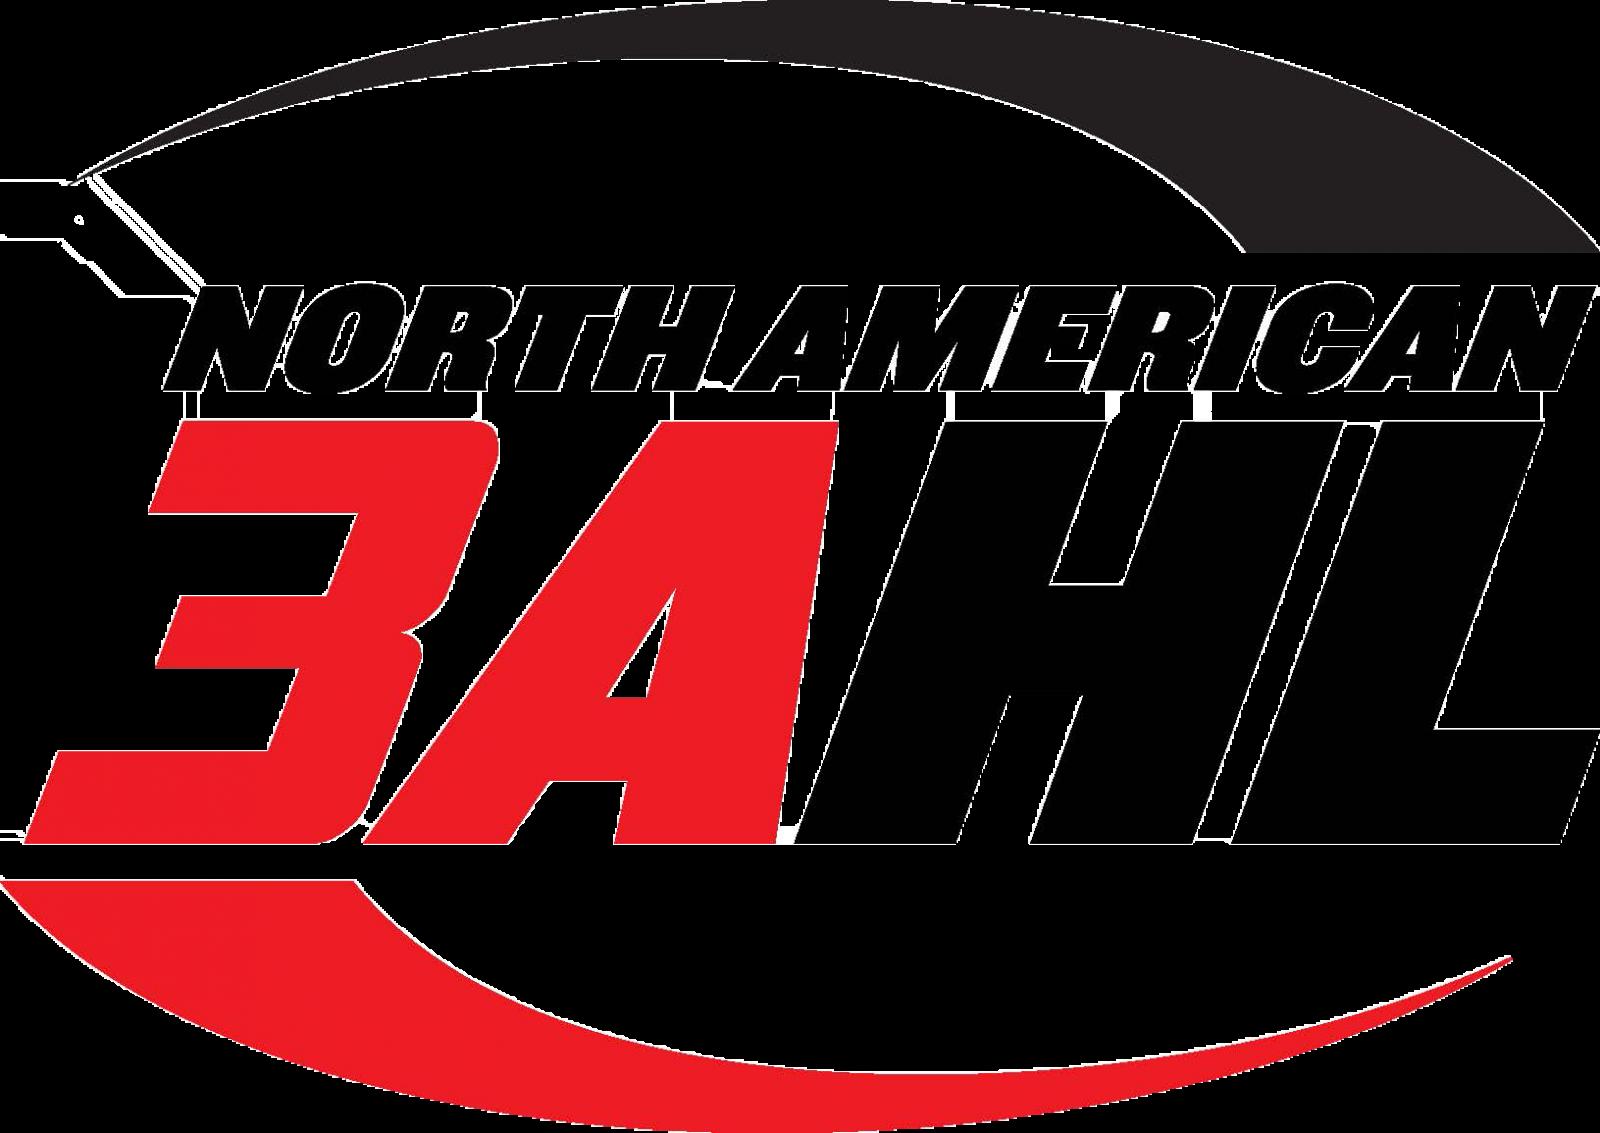 North American 3 Atlantic Hockey League Ice Hockey Wiki Fandom